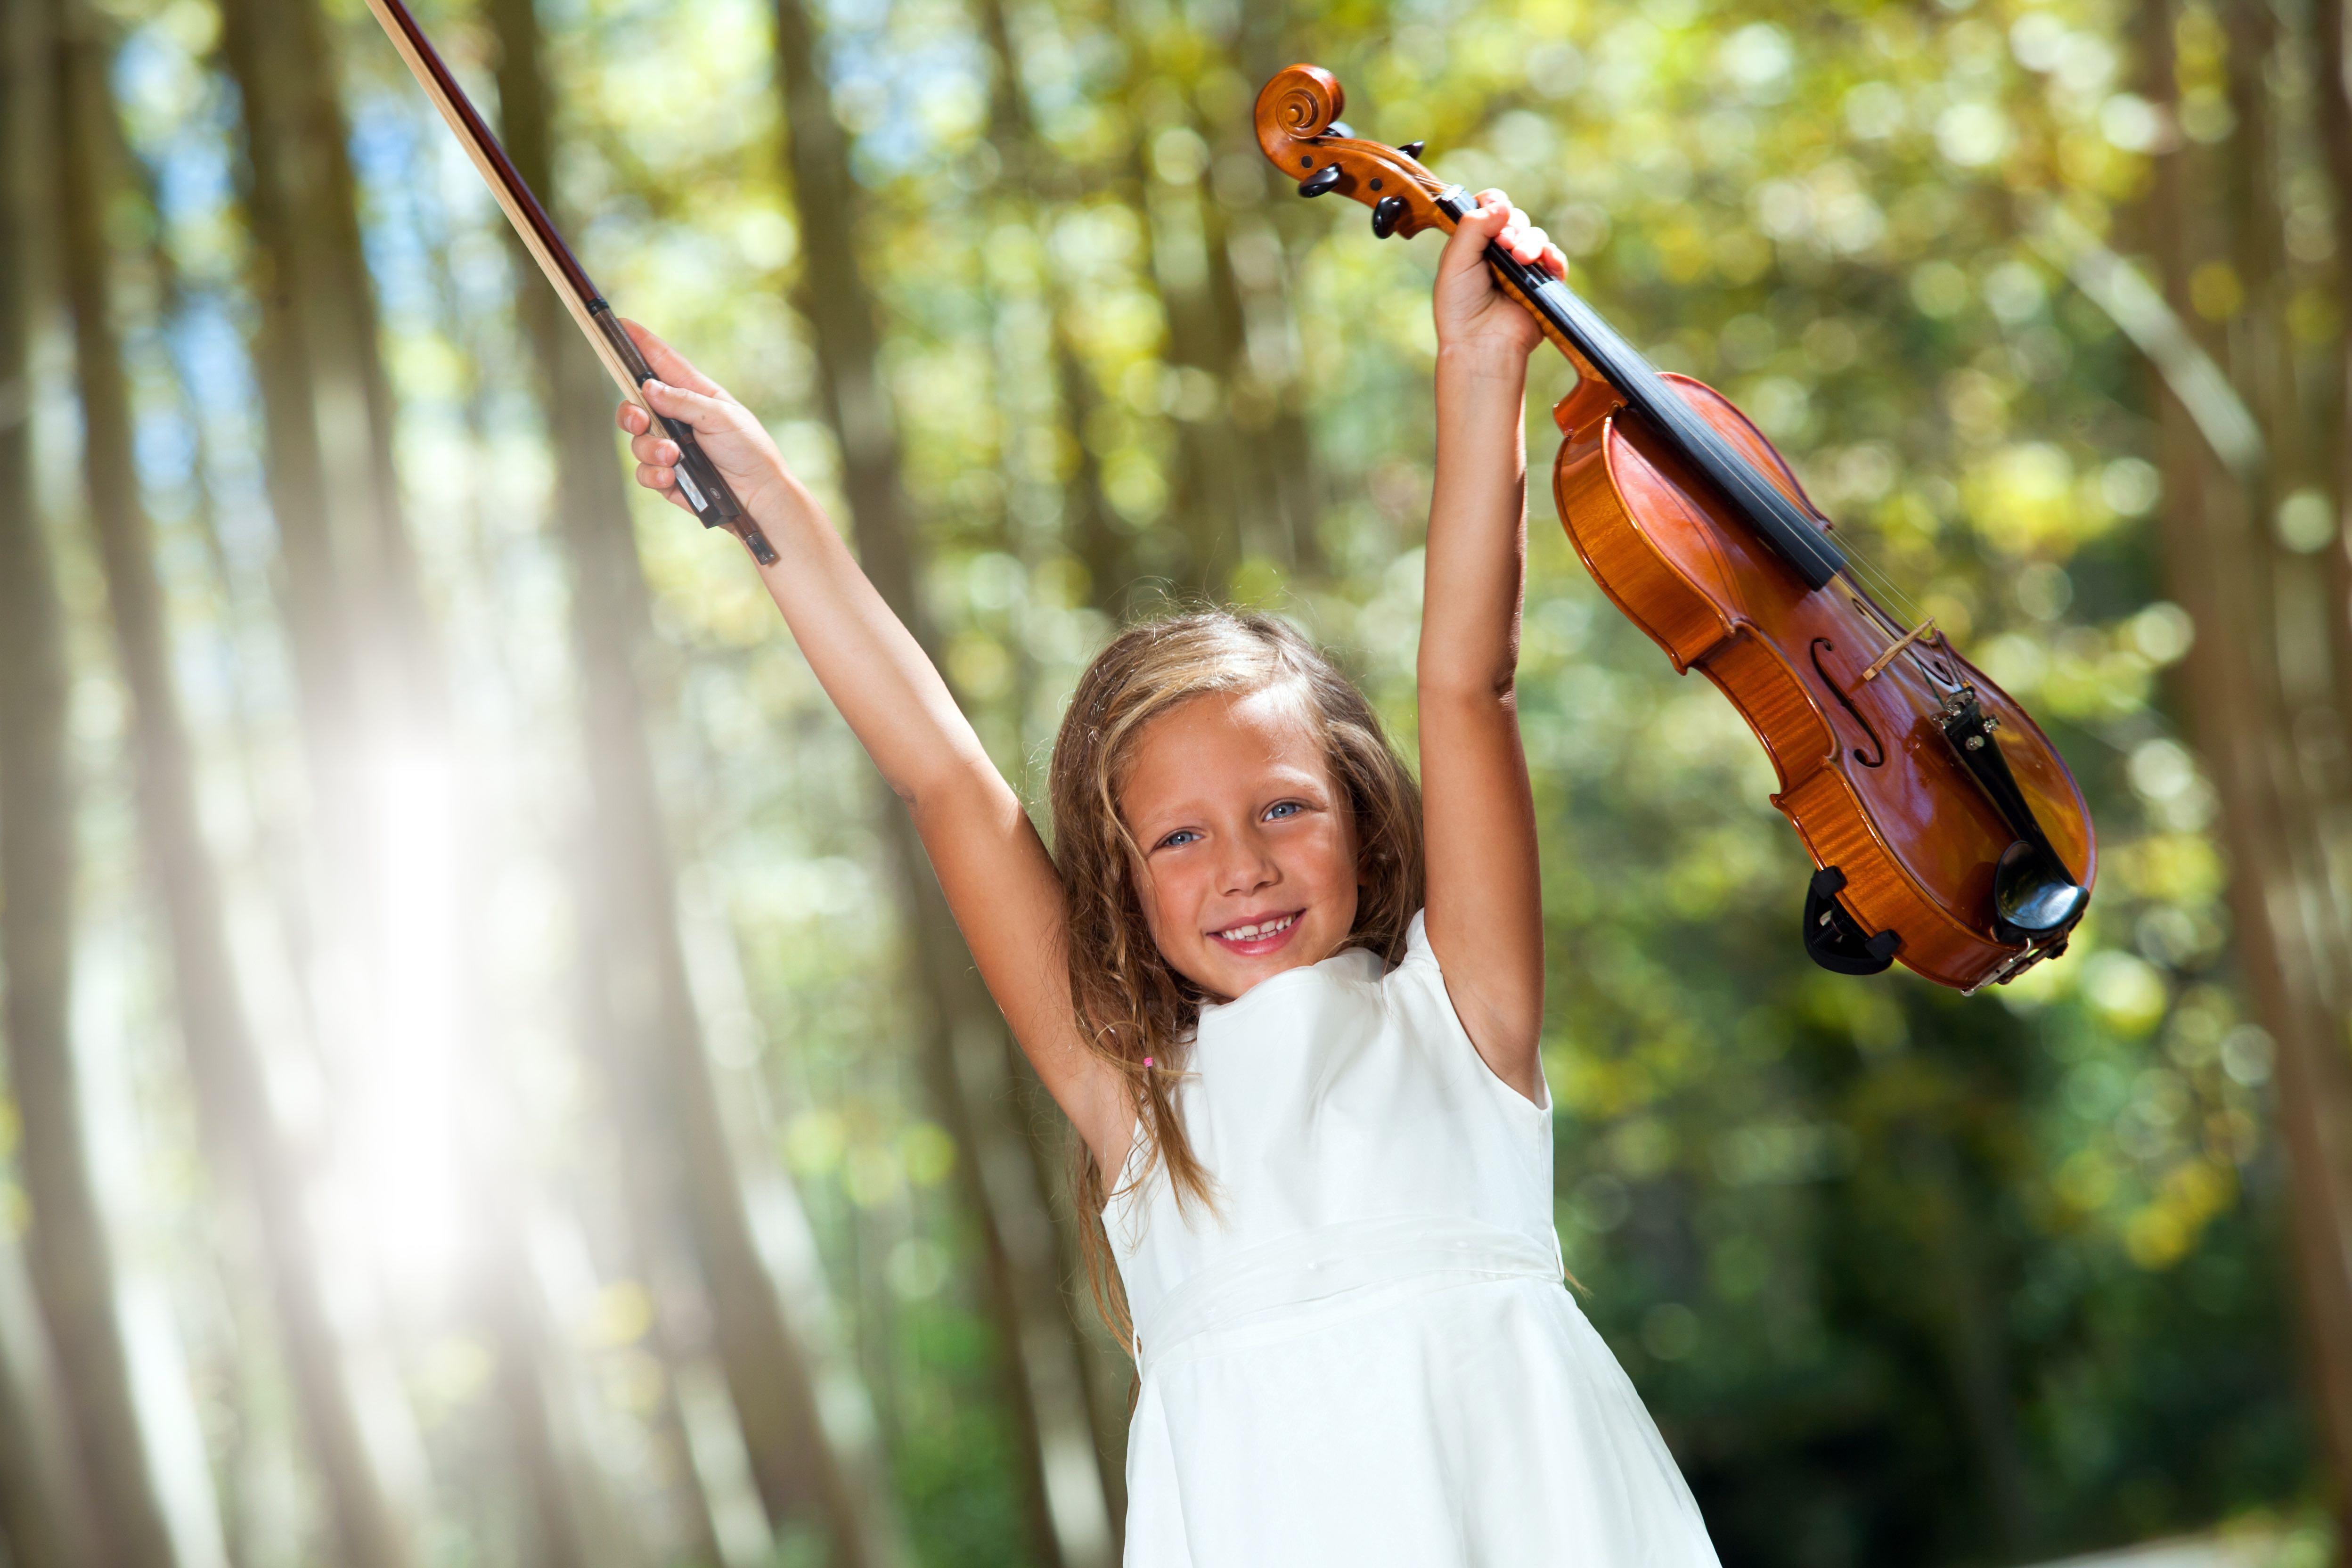 bigstock-Happy-Violinist-Raising-Violin-39724339-copy